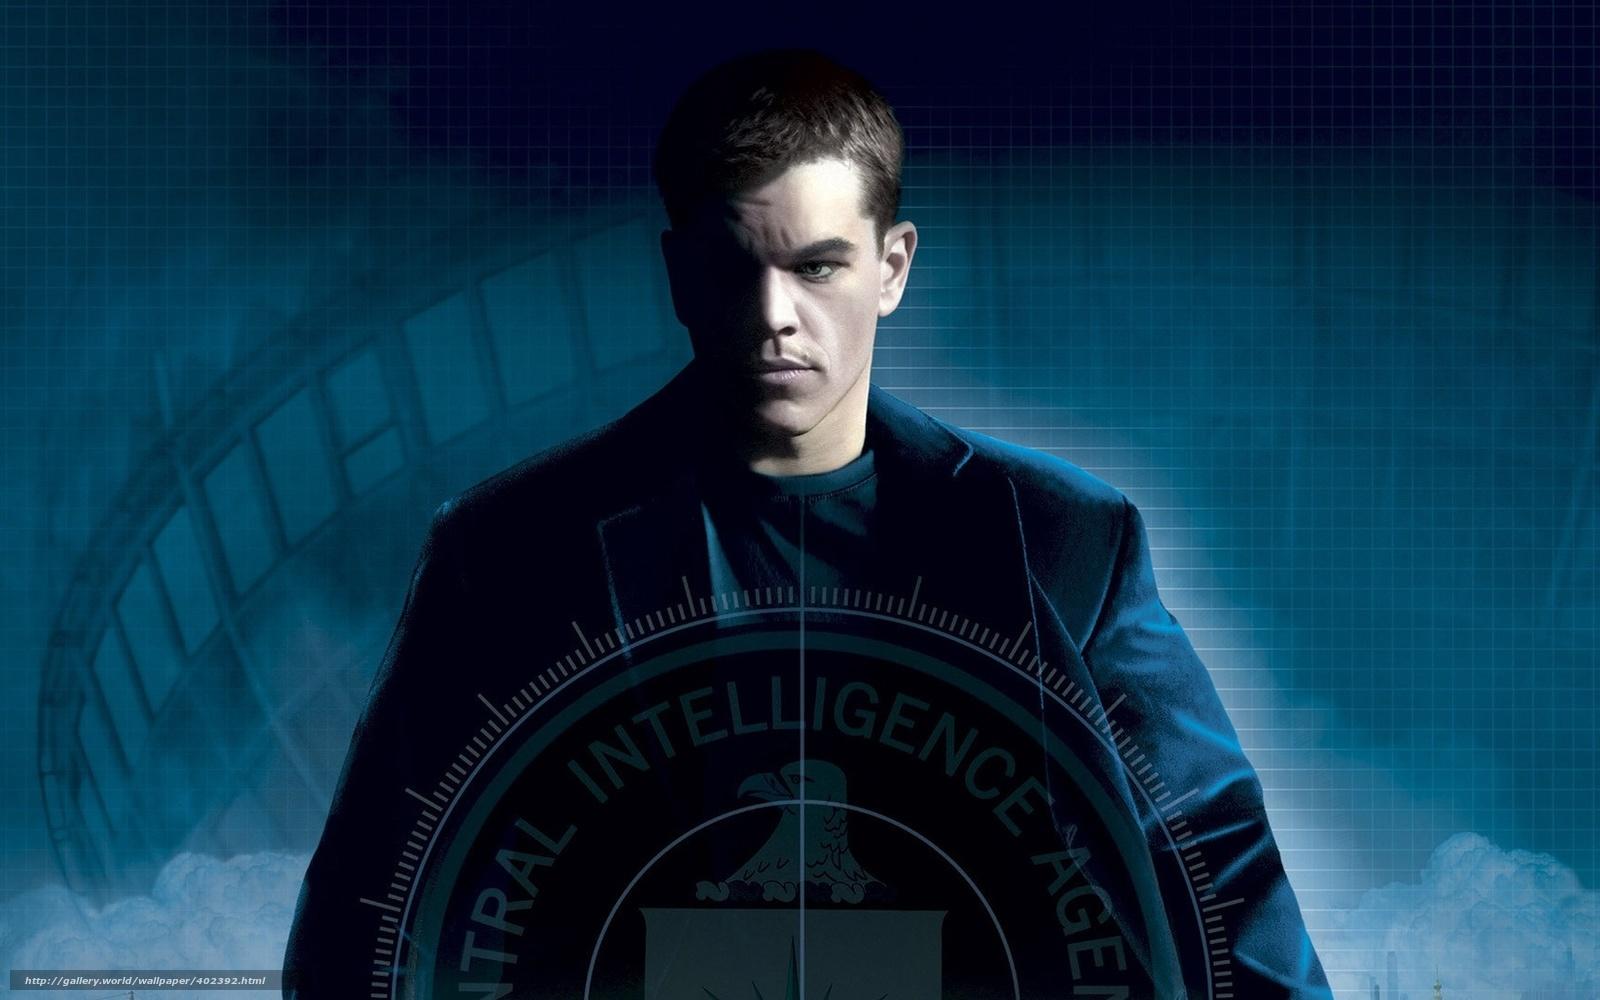 Download wallpaper The Bourne Supremacy,  wallpaper,  BORN,  Matt Damon free desktop wallpaper in the resolution 1680x1050 — picture №402392